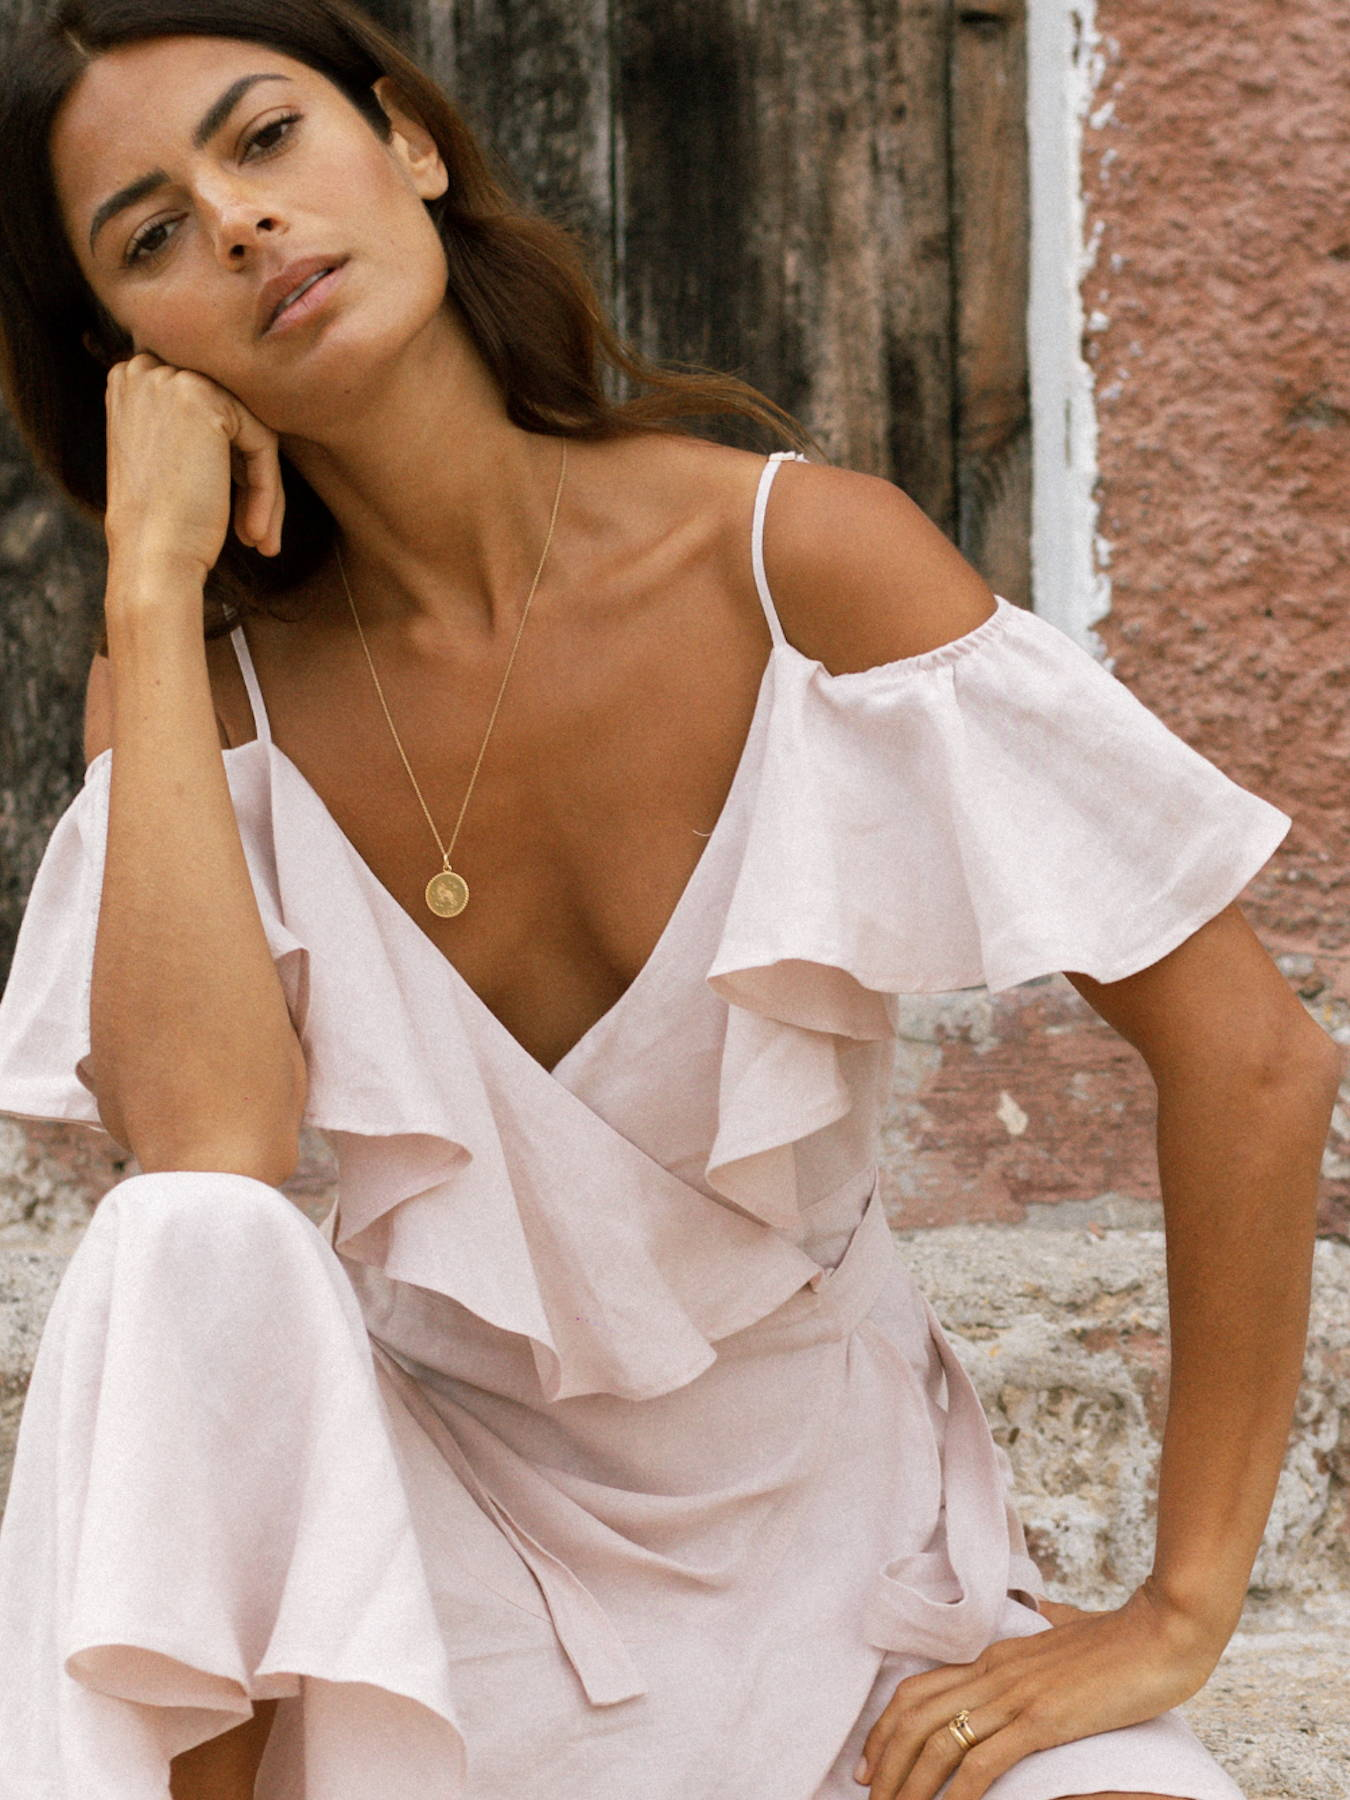 Purchase with Purpose Oramai London Cartagena Dress Sustainable Ethical Fashion